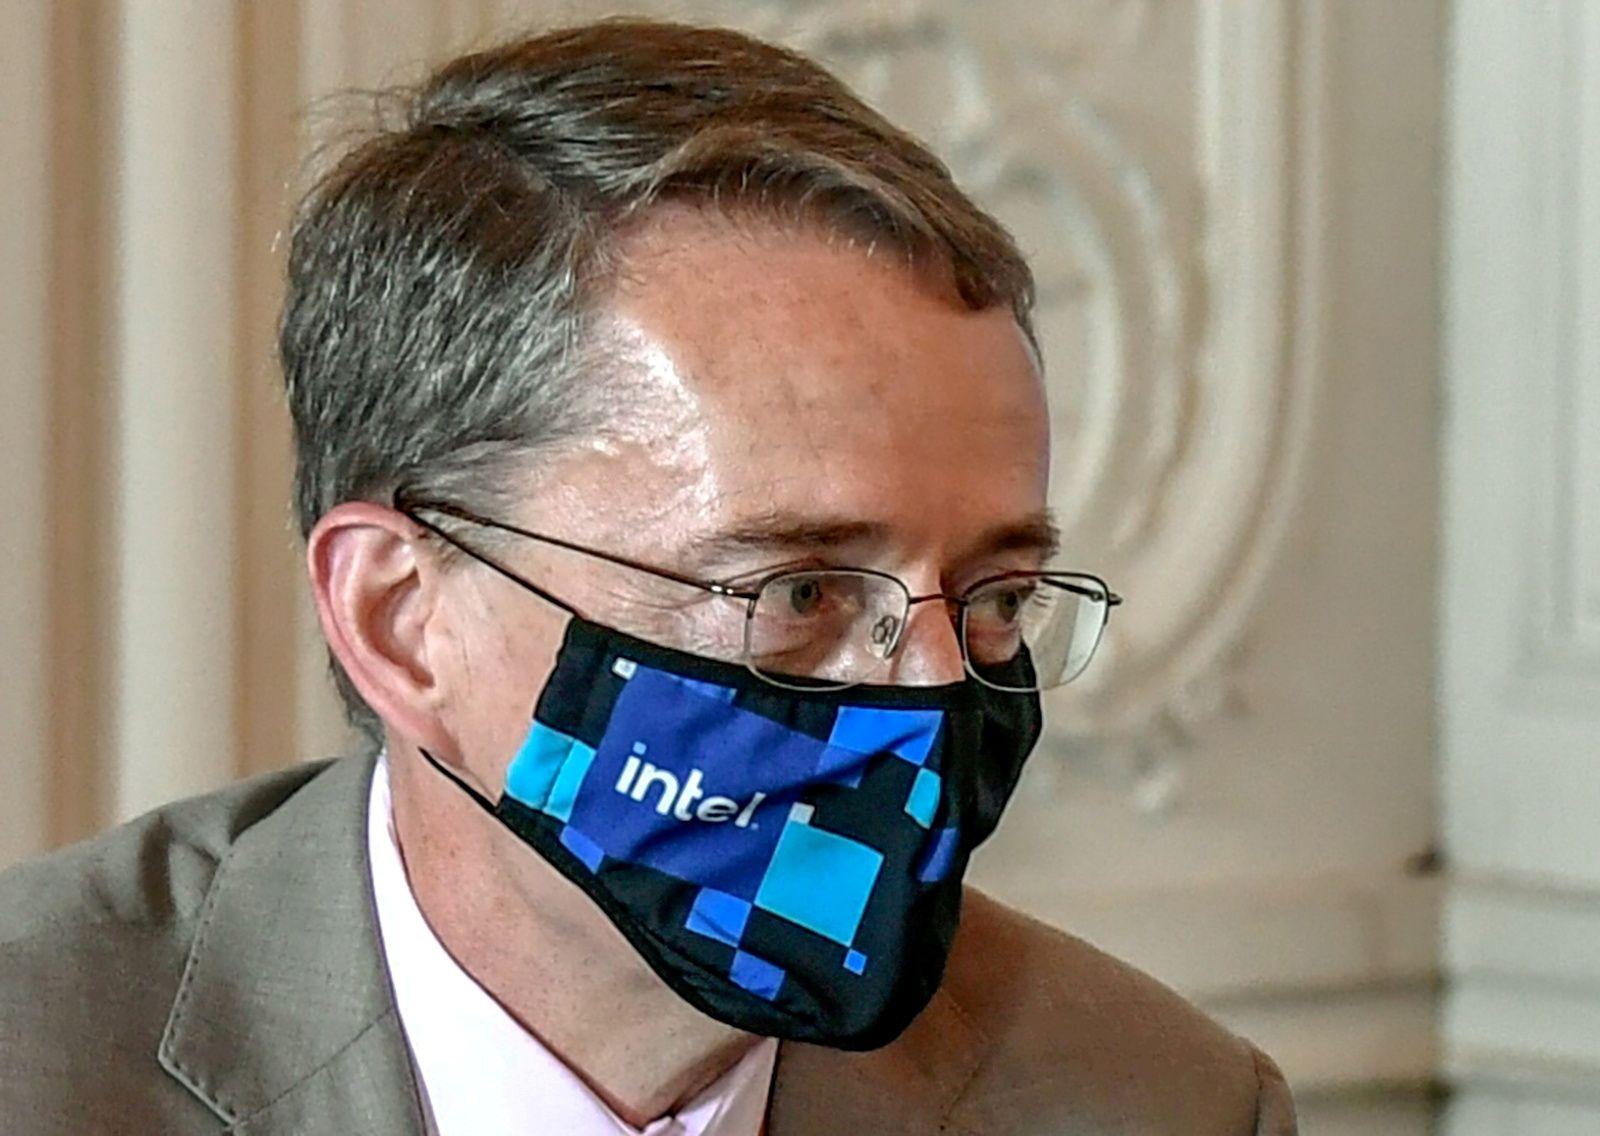 FILE PHOTO: Intel CEO Pat Gelsinger attends an international business leaders' meeting in Versailles, France